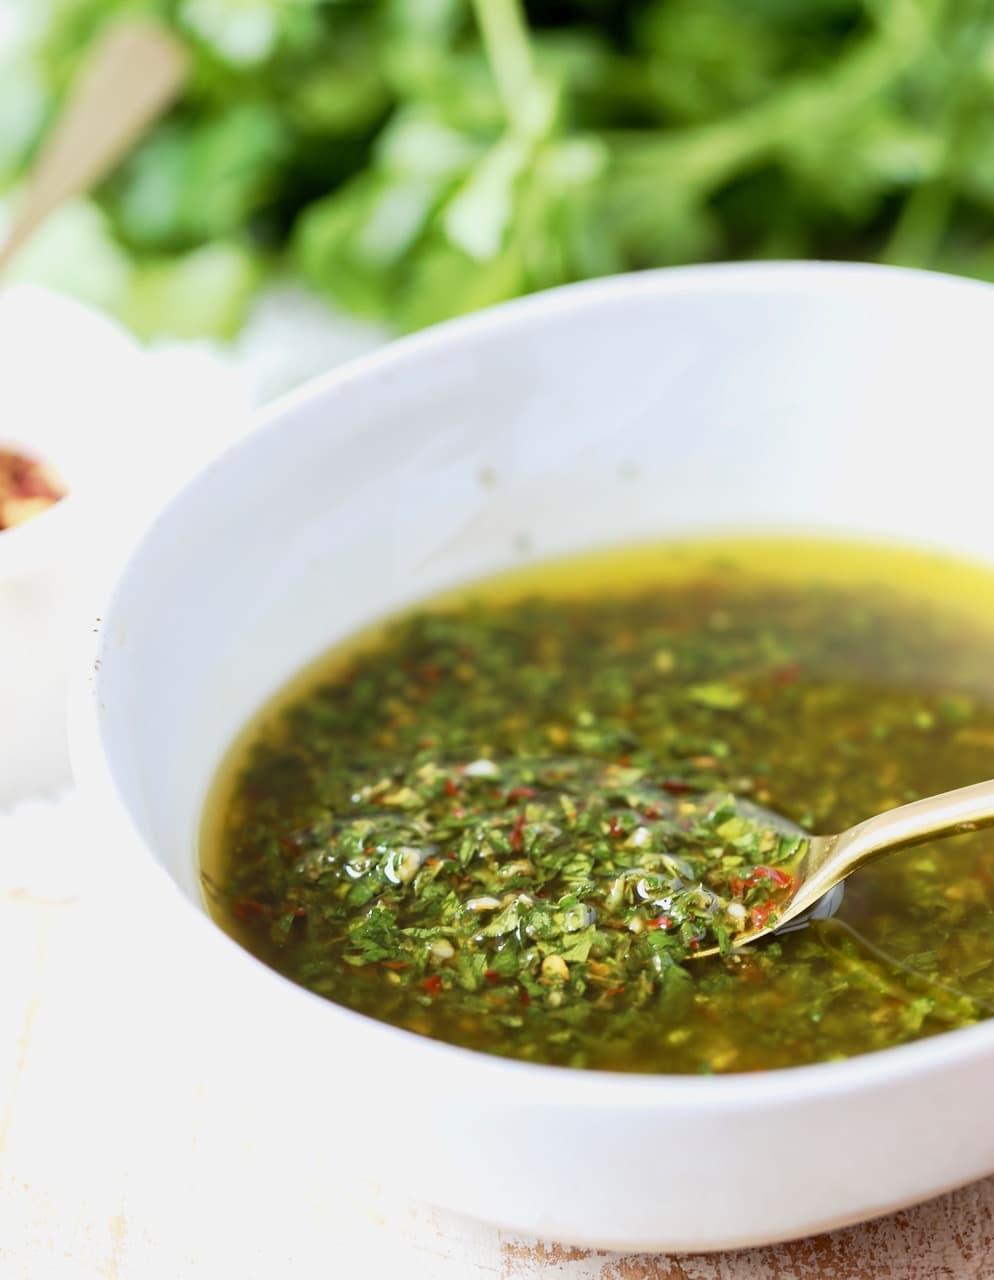 Easy 5 Minute Chimichurri Sauce Recipe